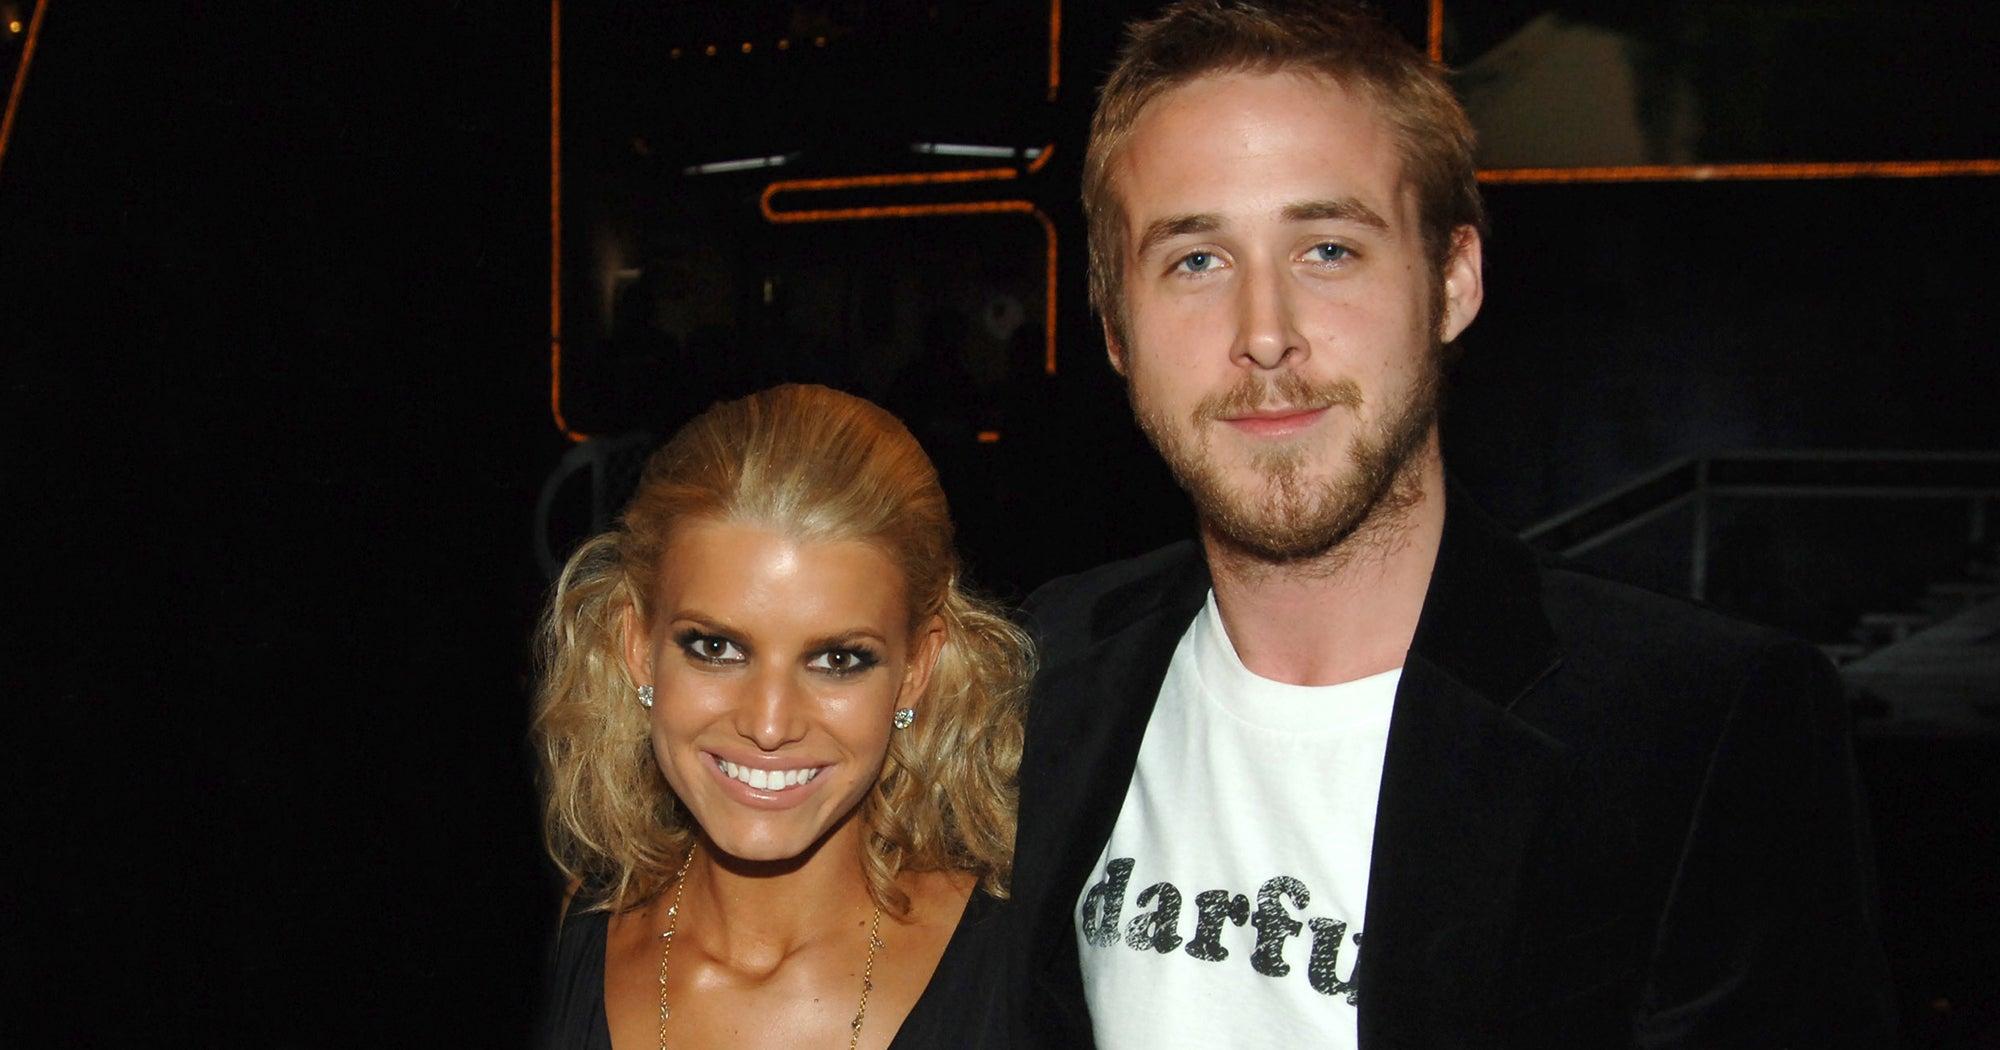 Justin Timberlake Ryan Gosling Kissed Jessica Simpson